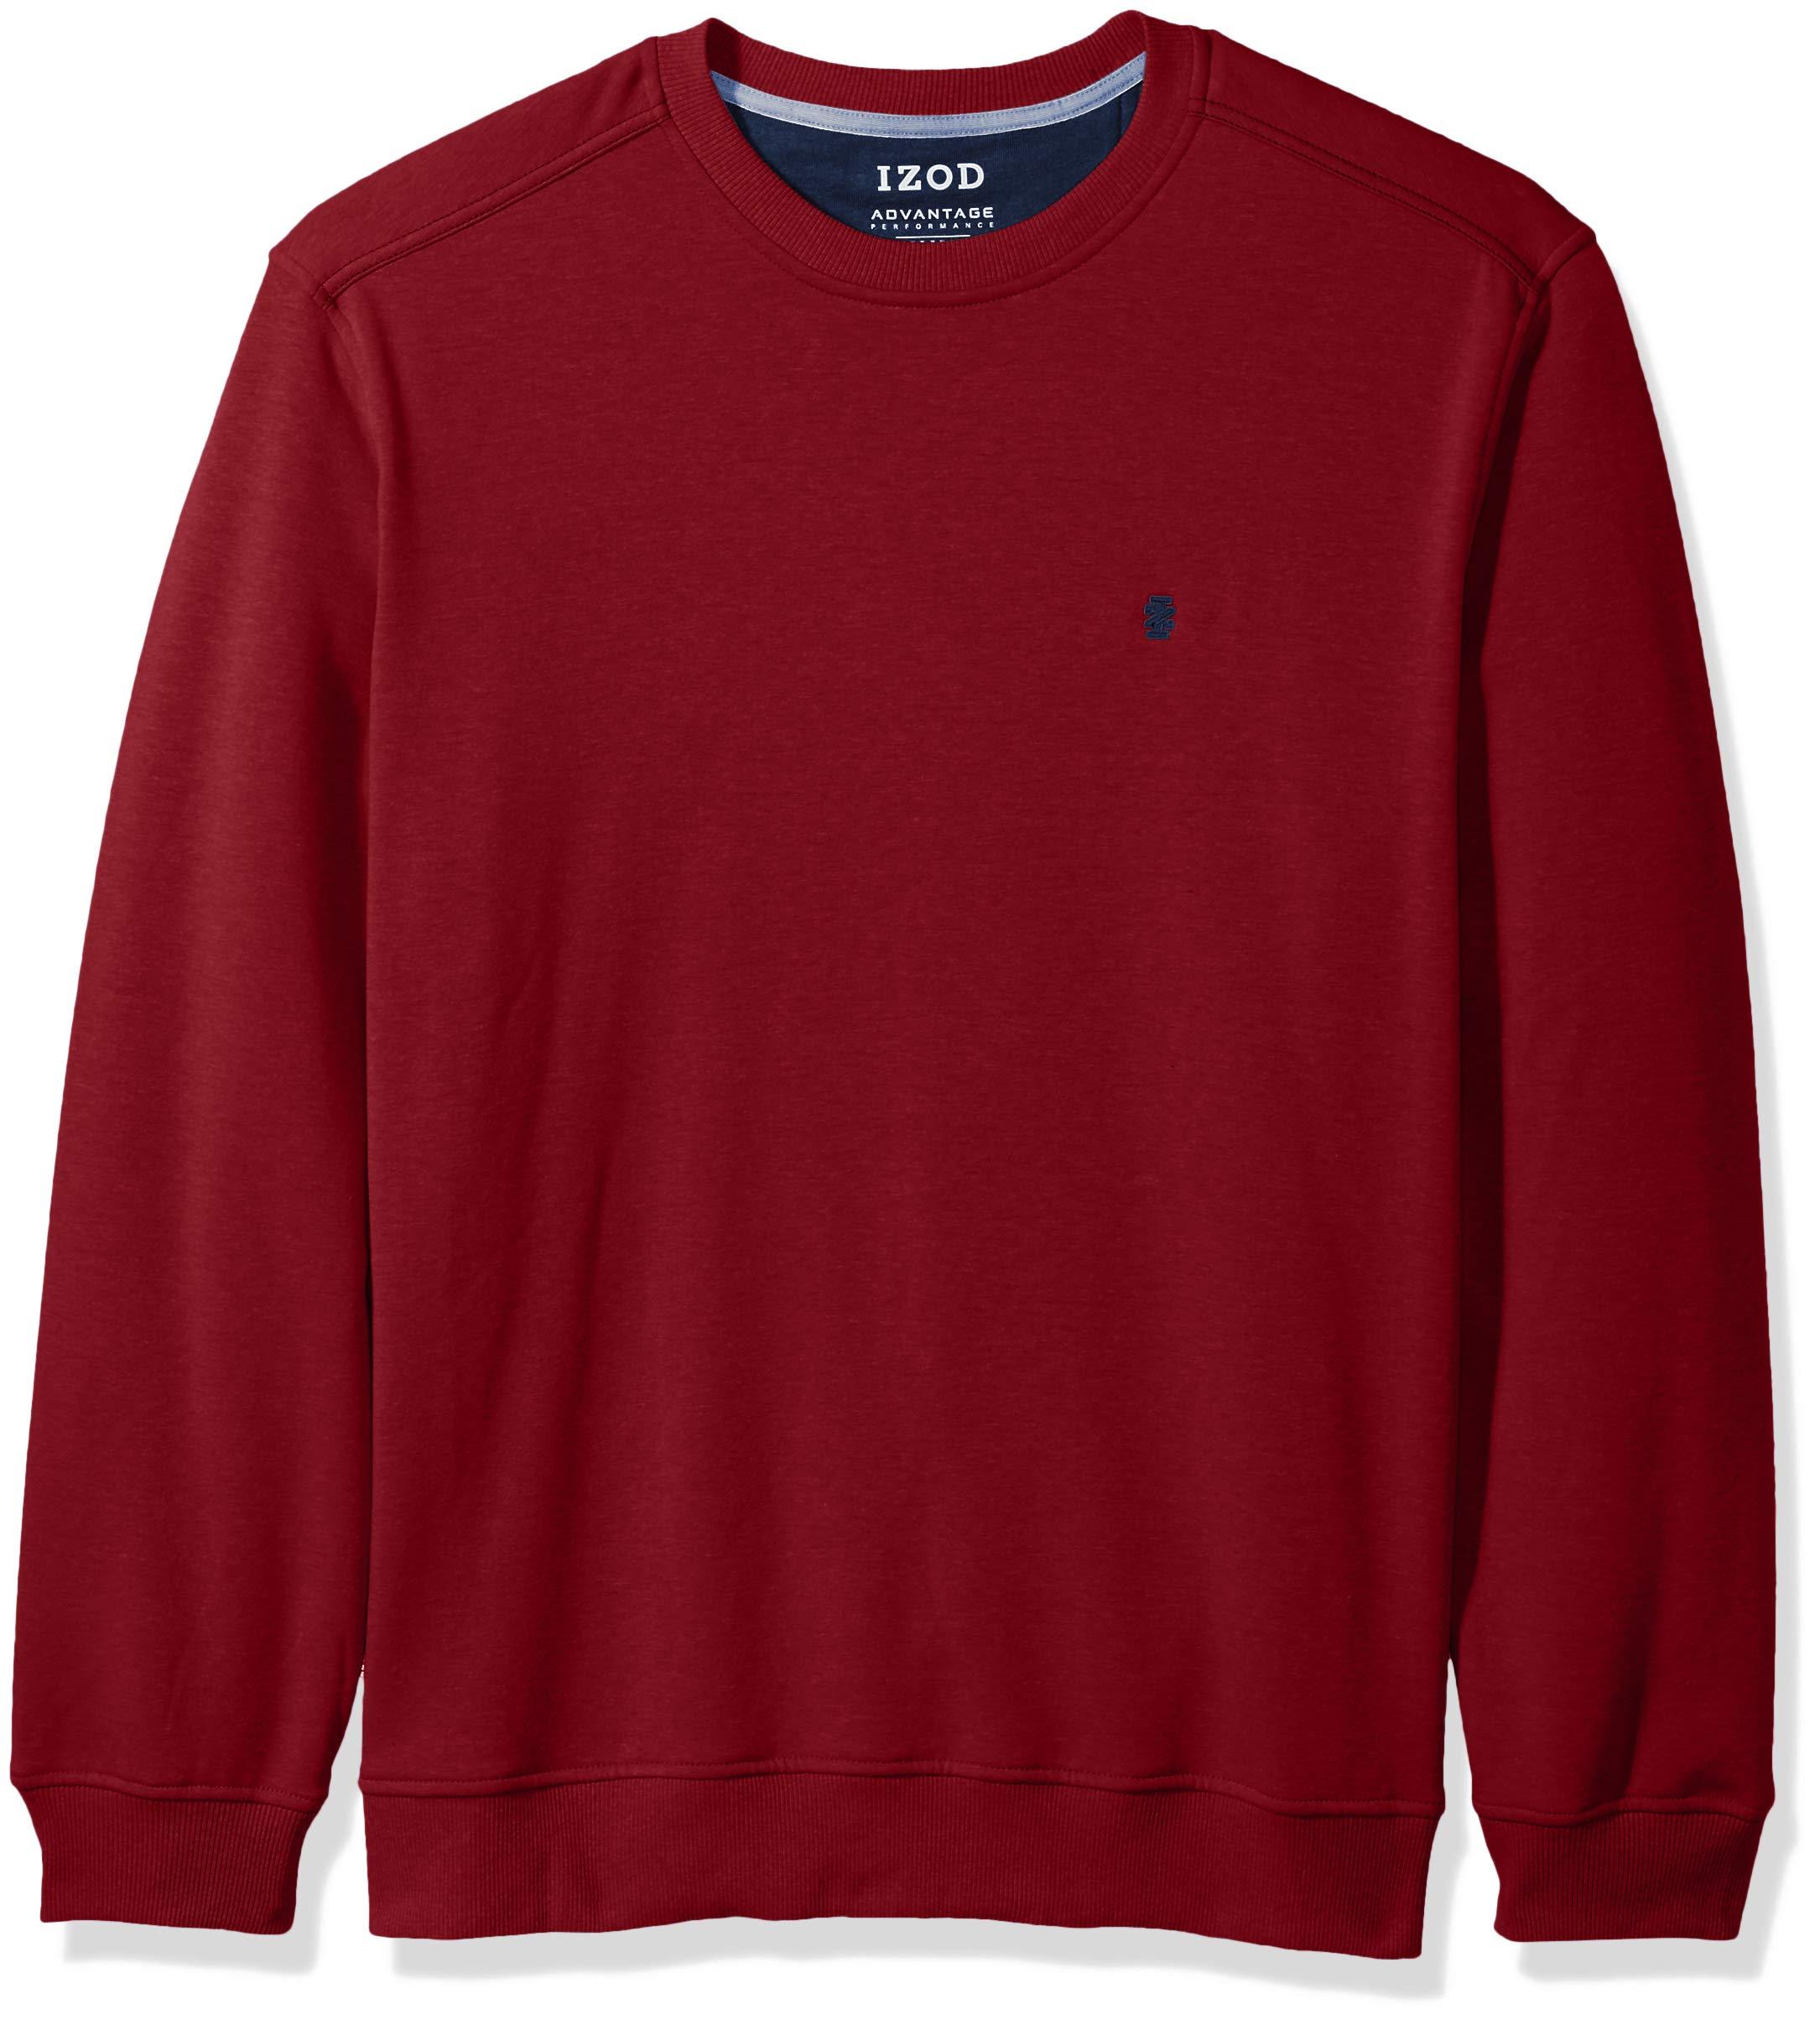 IZOD Men's Advantage Performance Long Sleeve Solid Fleece Soft Crewneck Pullover, Biking Dark red Small